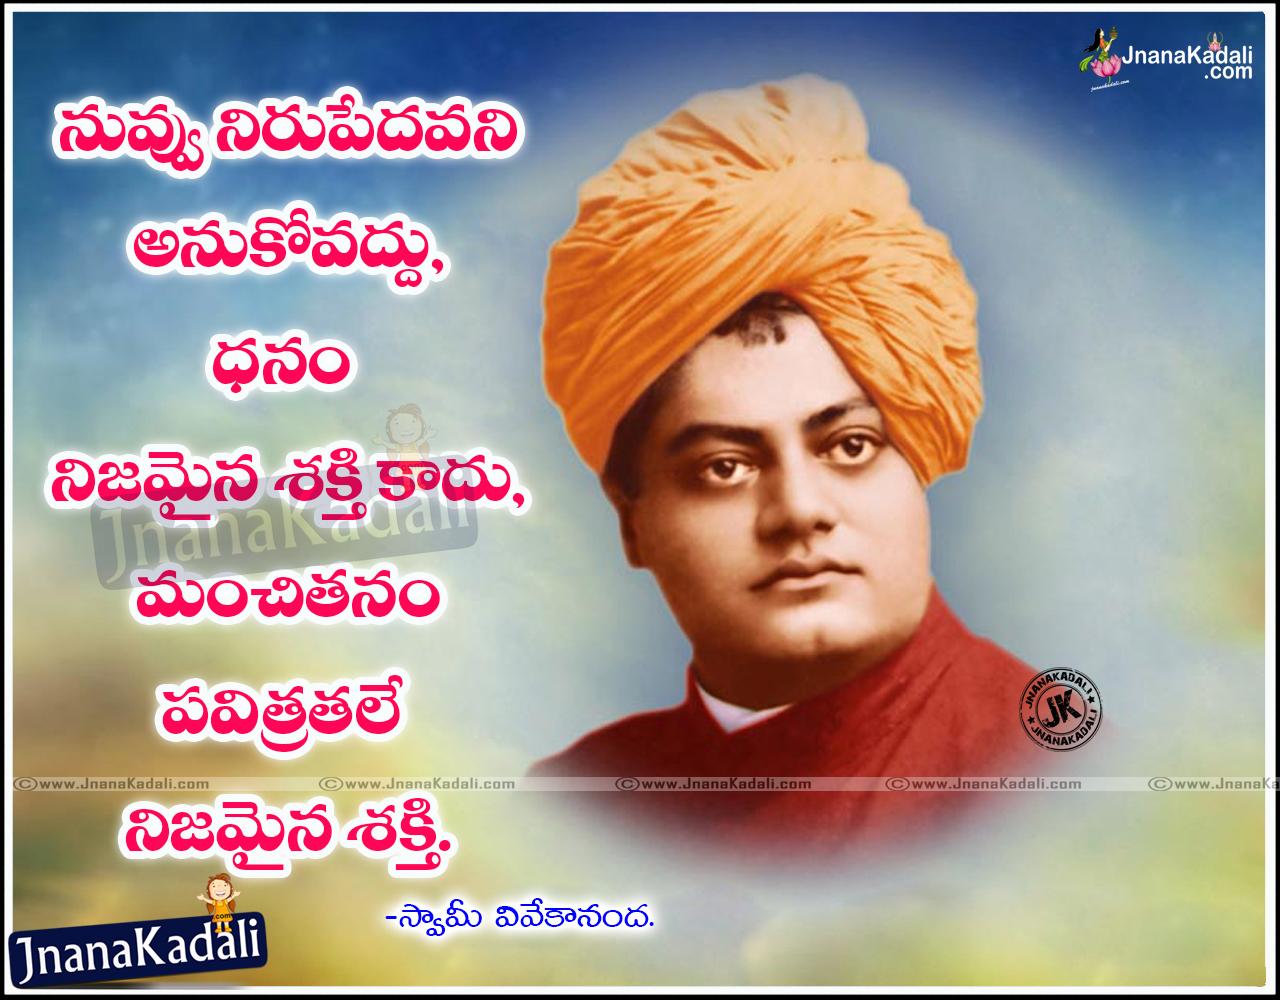 Swami Vivekananda Powerful Quotes In Telugu The Emoji